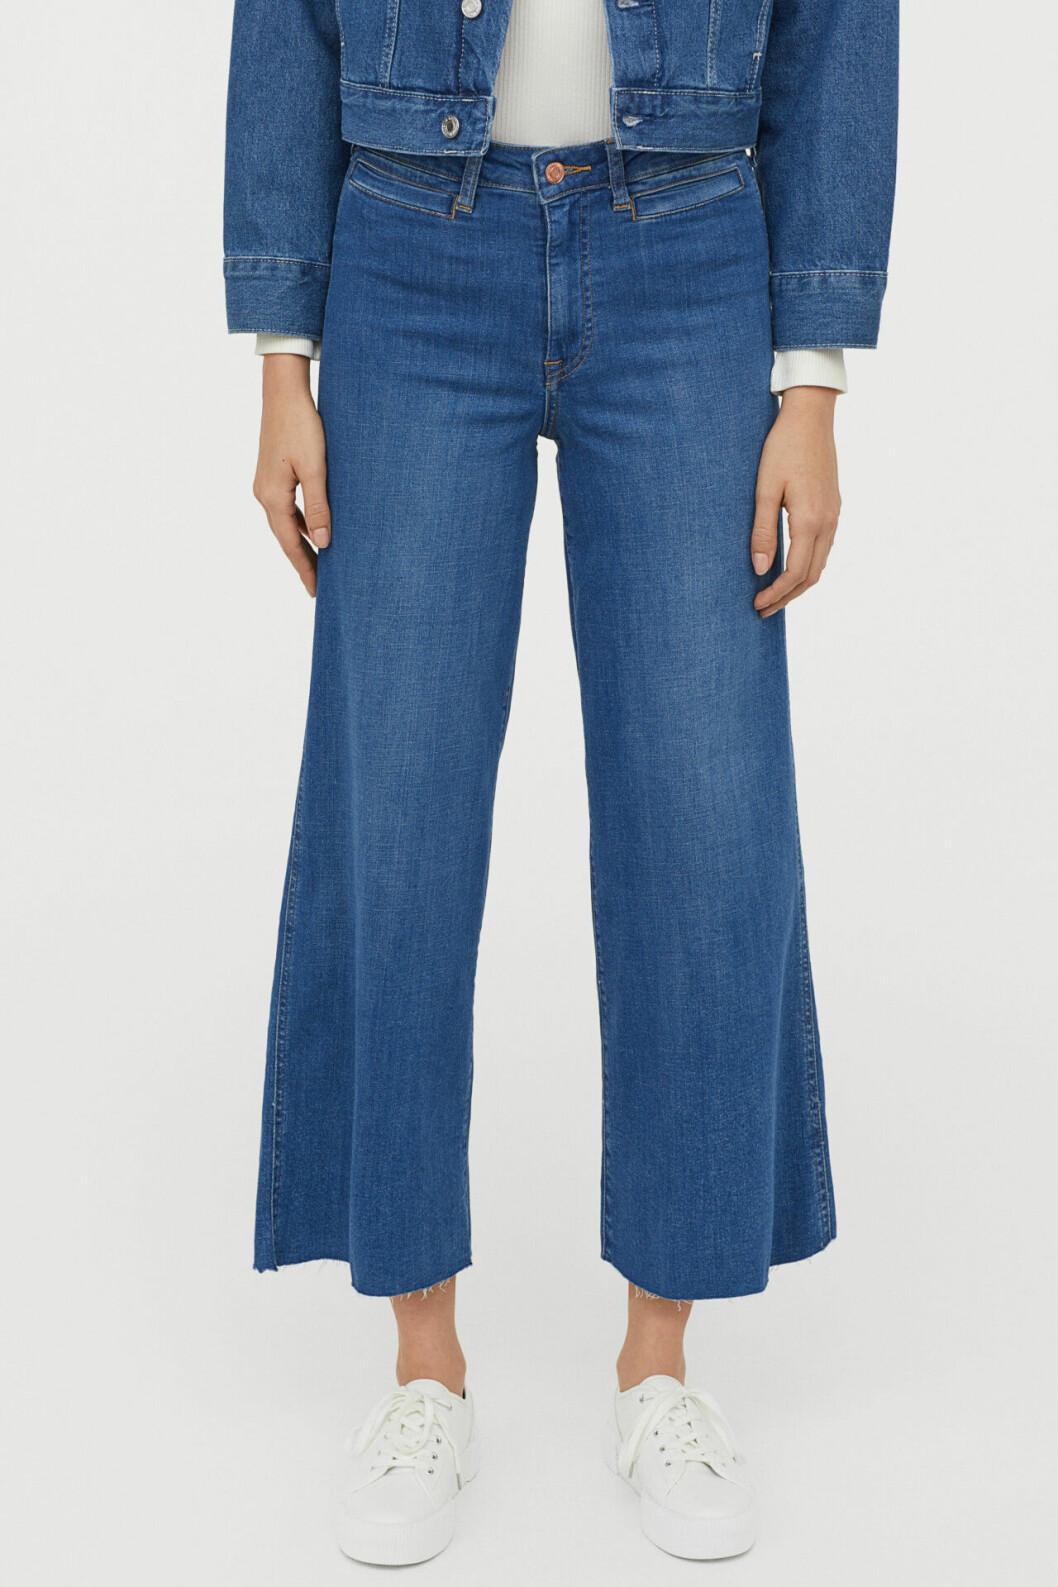 Blå jeans med vida ben